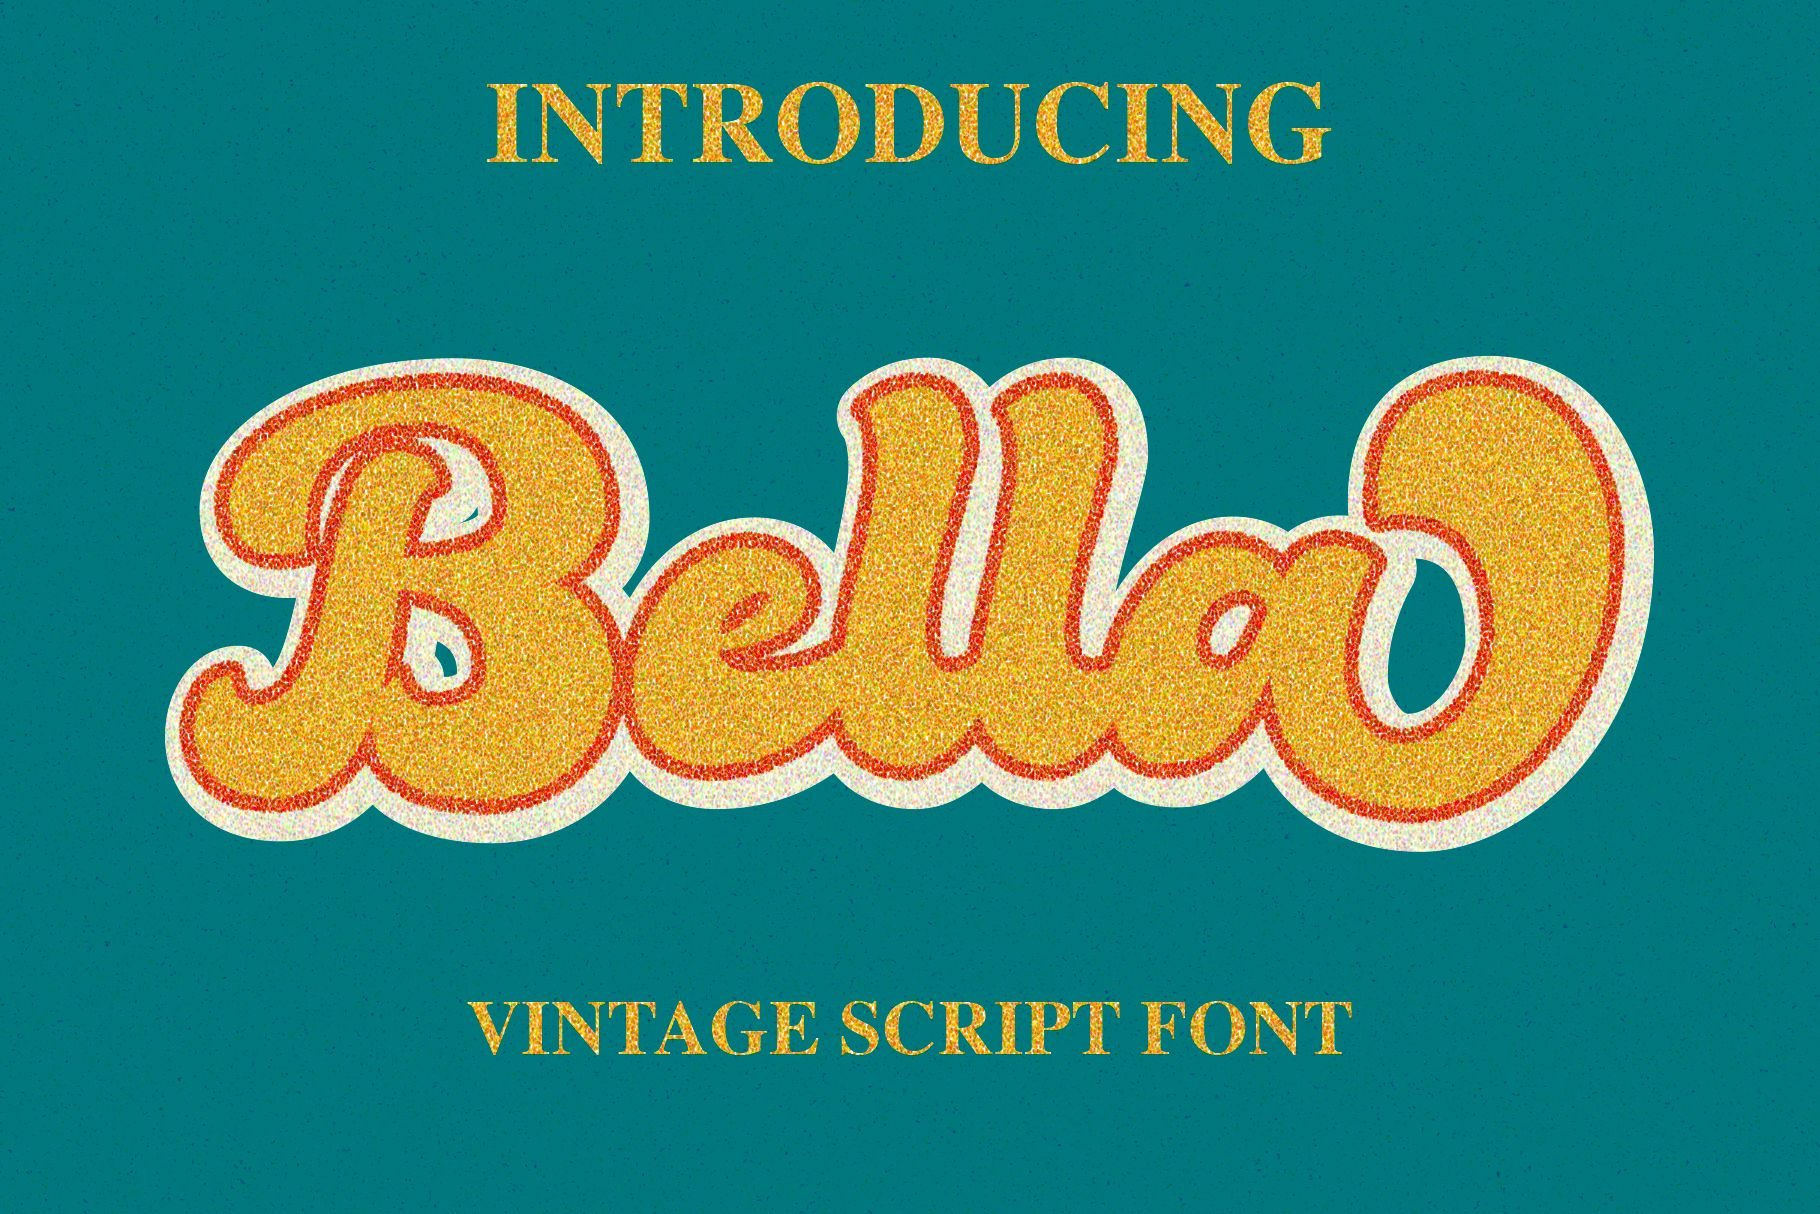 Bella Vintage Script Font 193523 Script Font Bundles Vintage Script Fonts Script Fonts Script